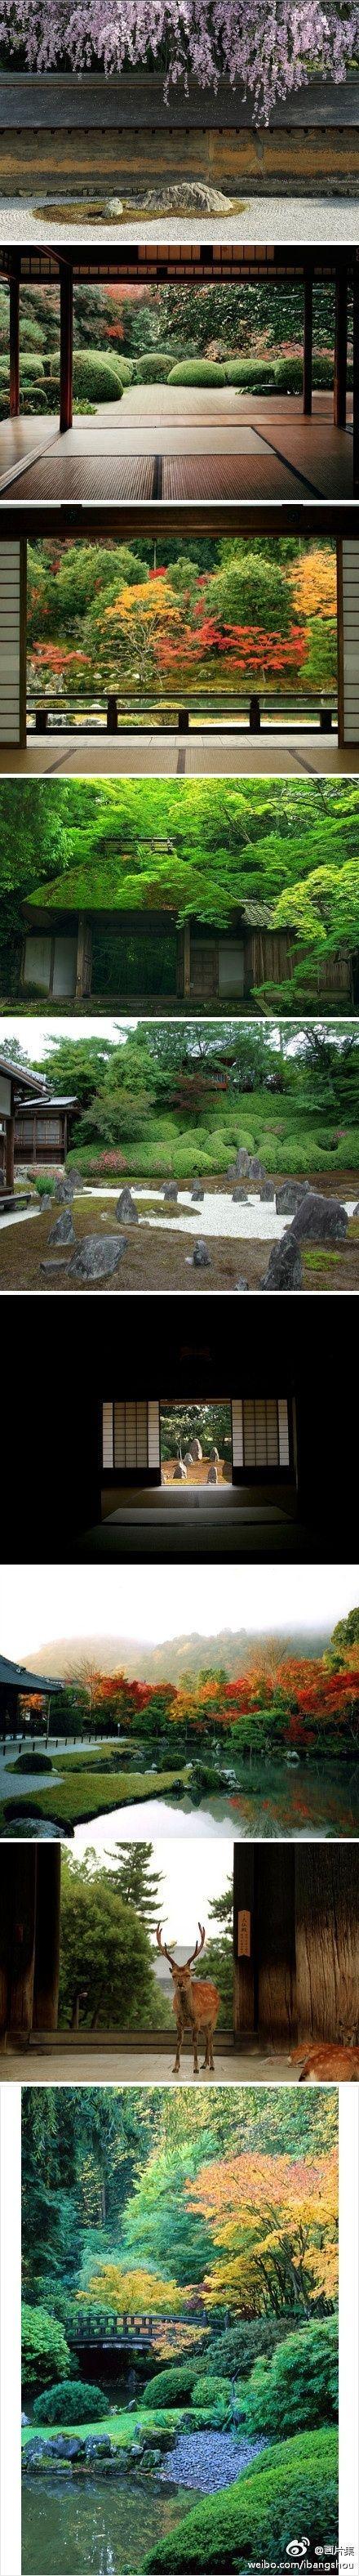 ~日本庭園,极富禅韵。Japanese garden | House of Beccaria